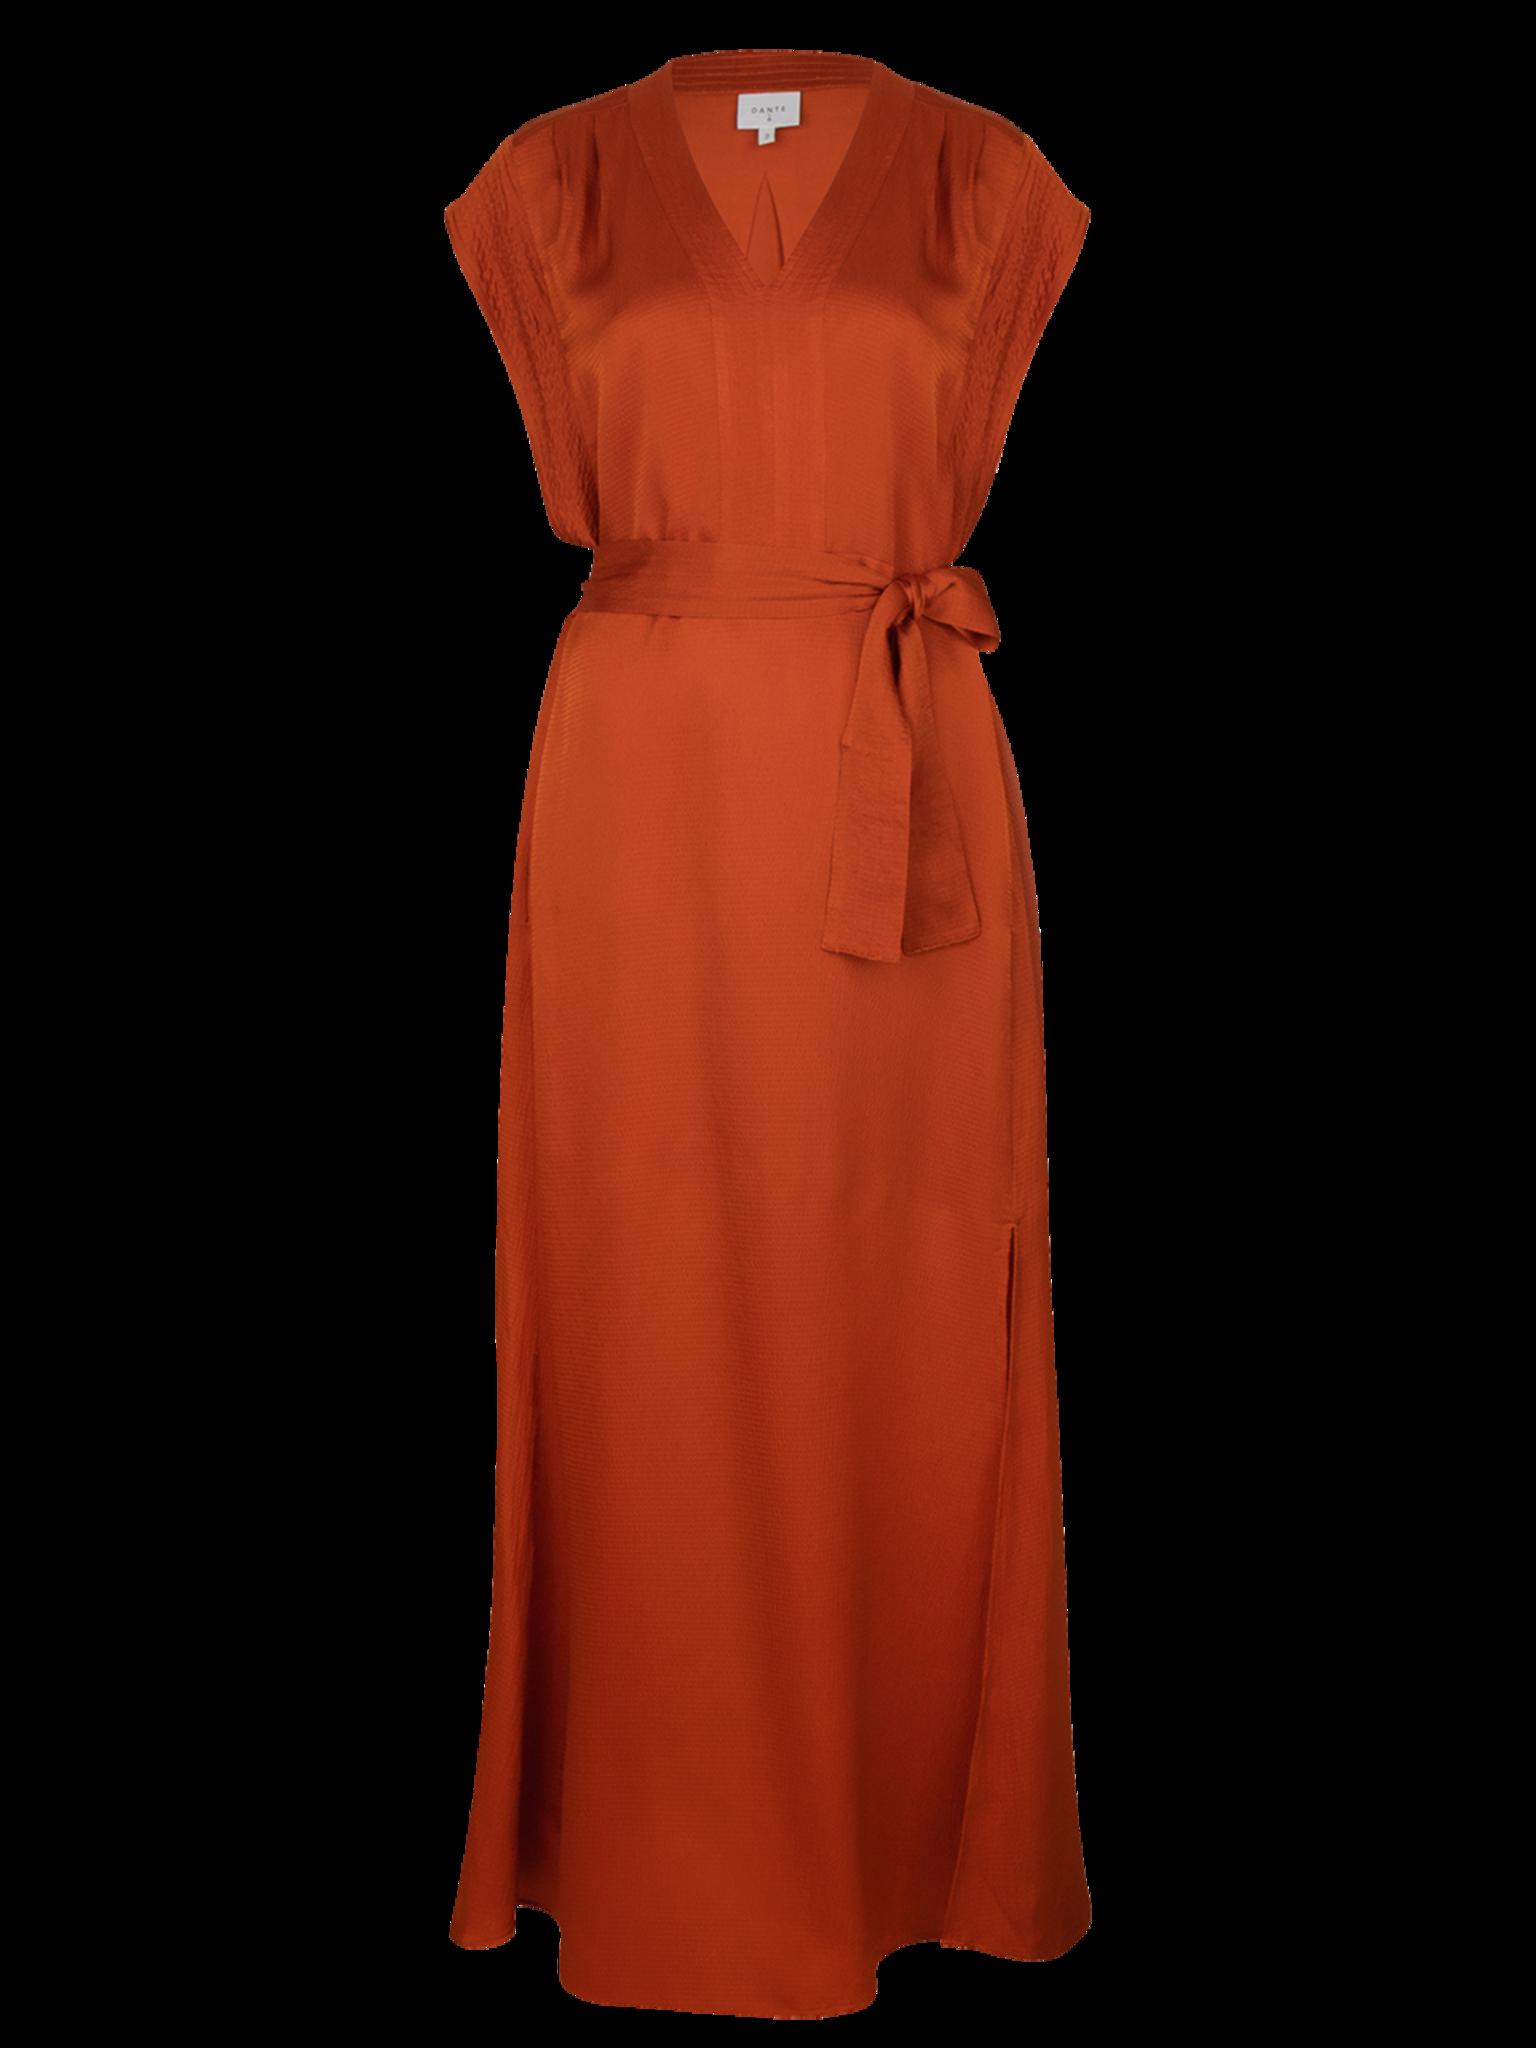 Dante 6 Dress 211115 JASIEL-1